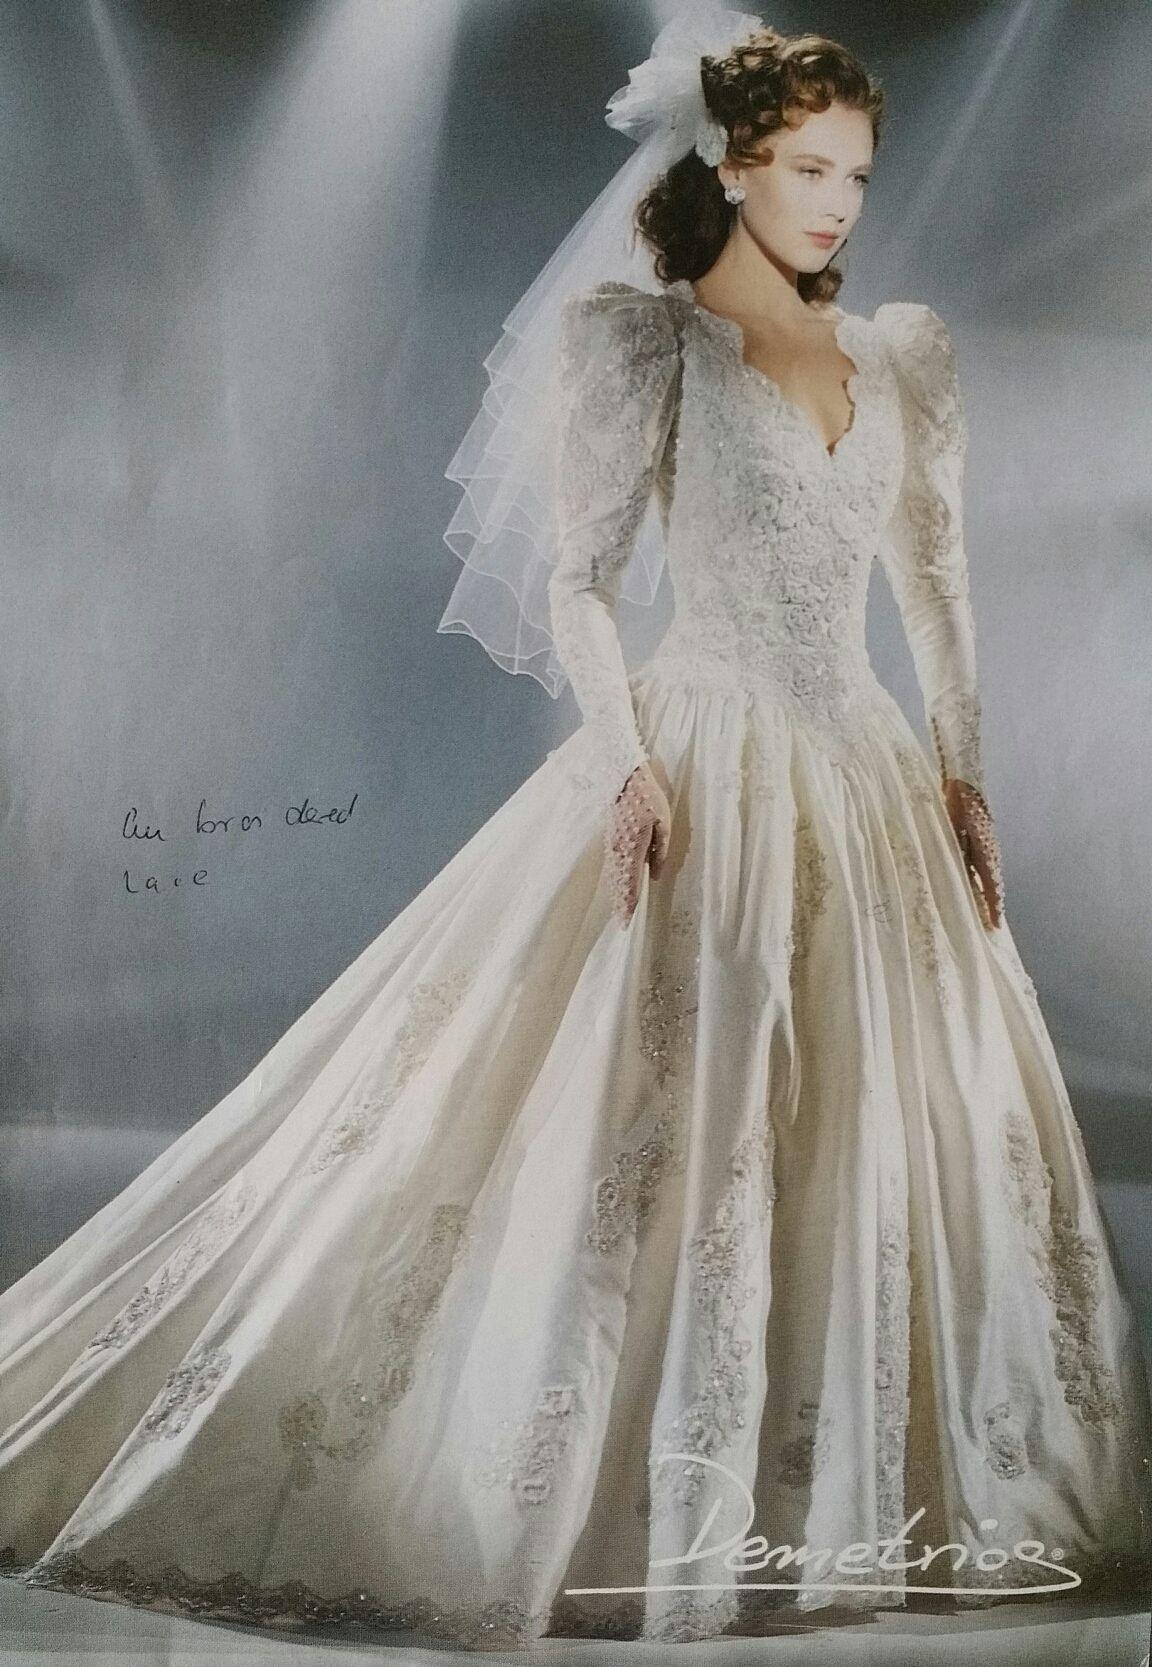 Demetrios Wedding Gowns 030 - Demetrios Wedding Gowns